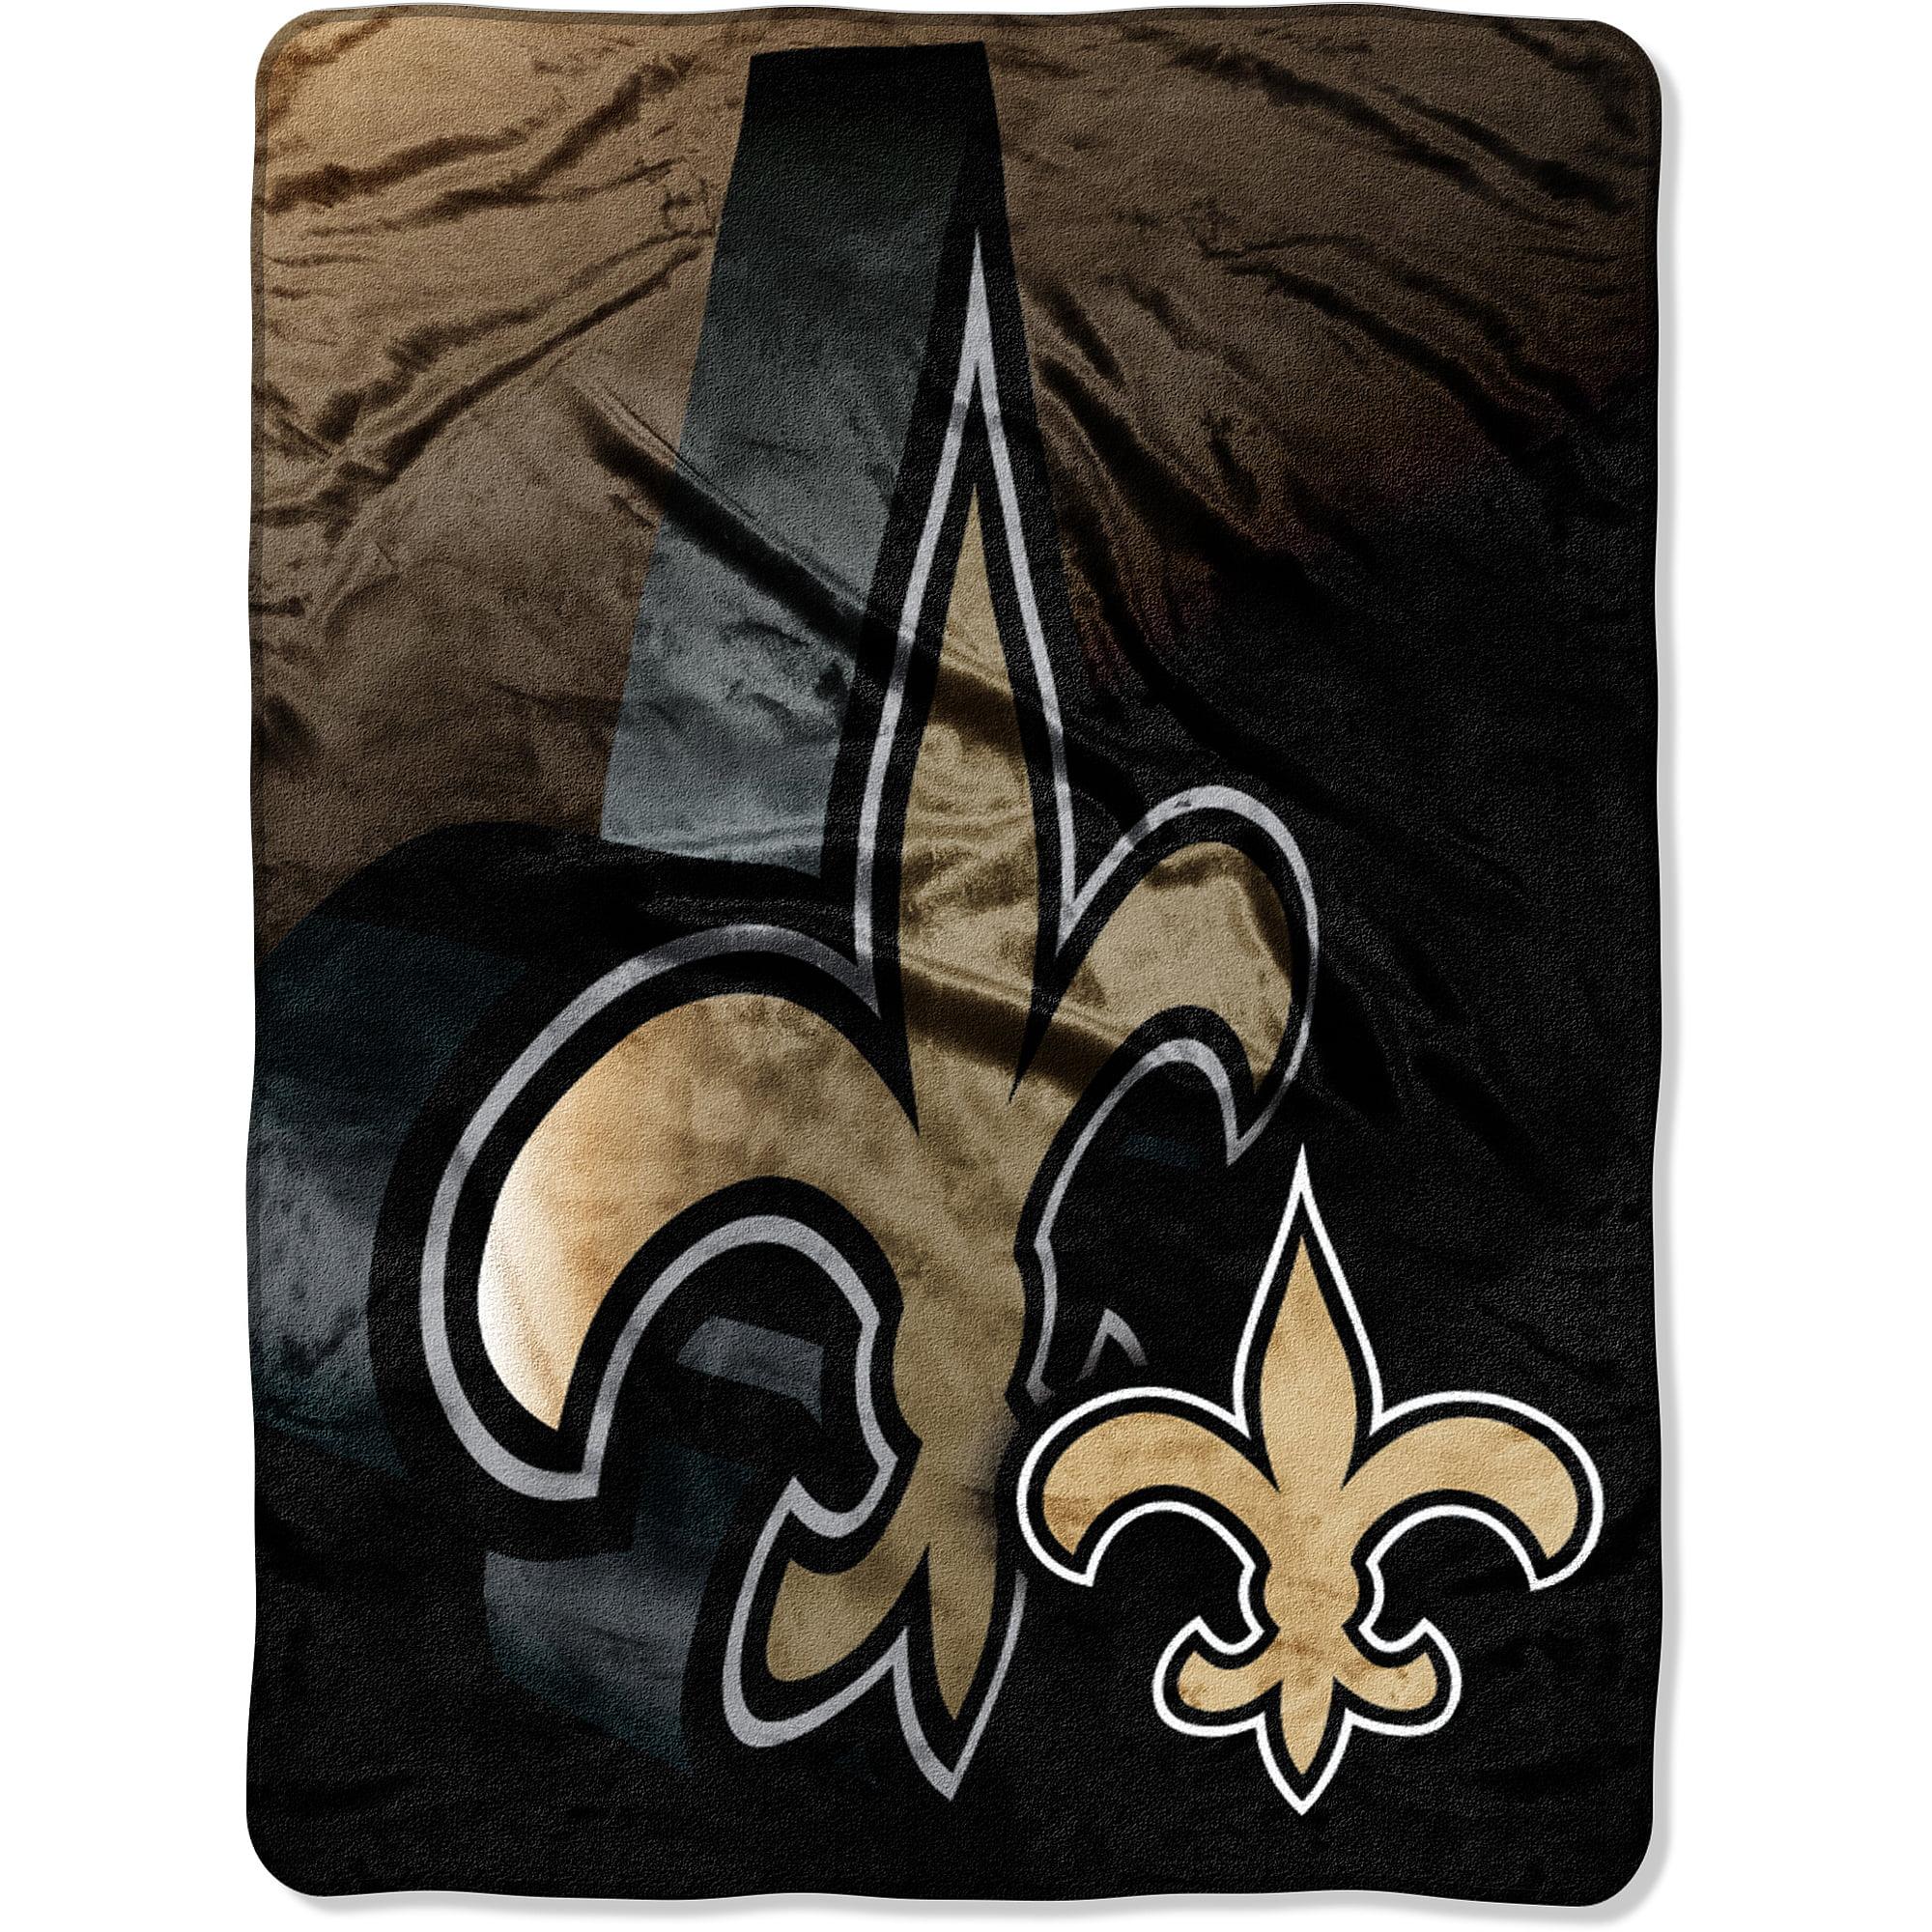 Toddler New Orleans Saints Black Blanket Sleeper